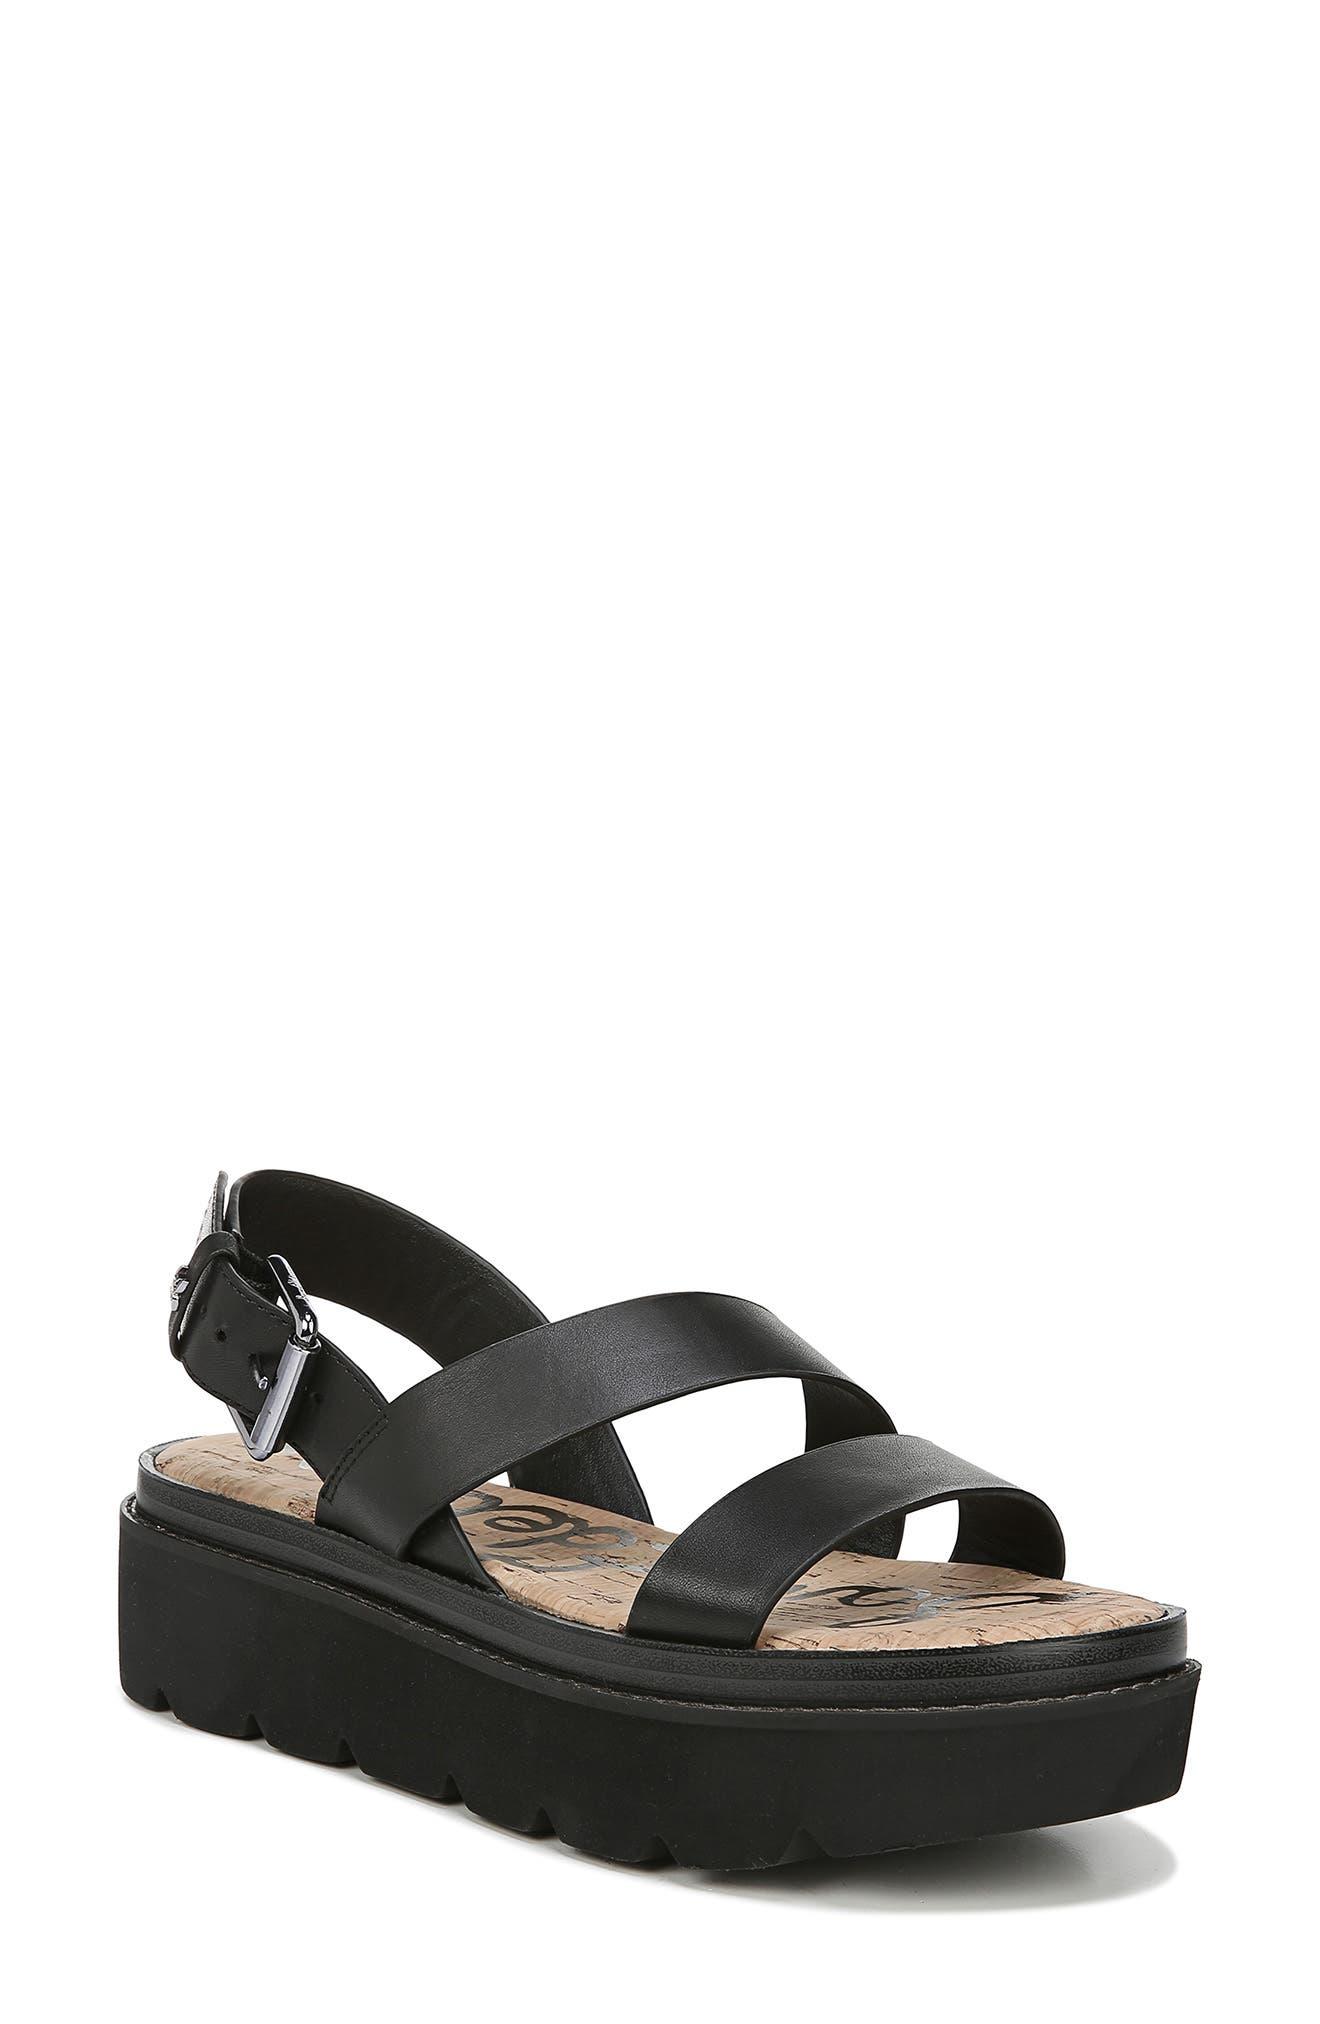 Sam Edelman Rasheed Slingback Platform Sandal, Black